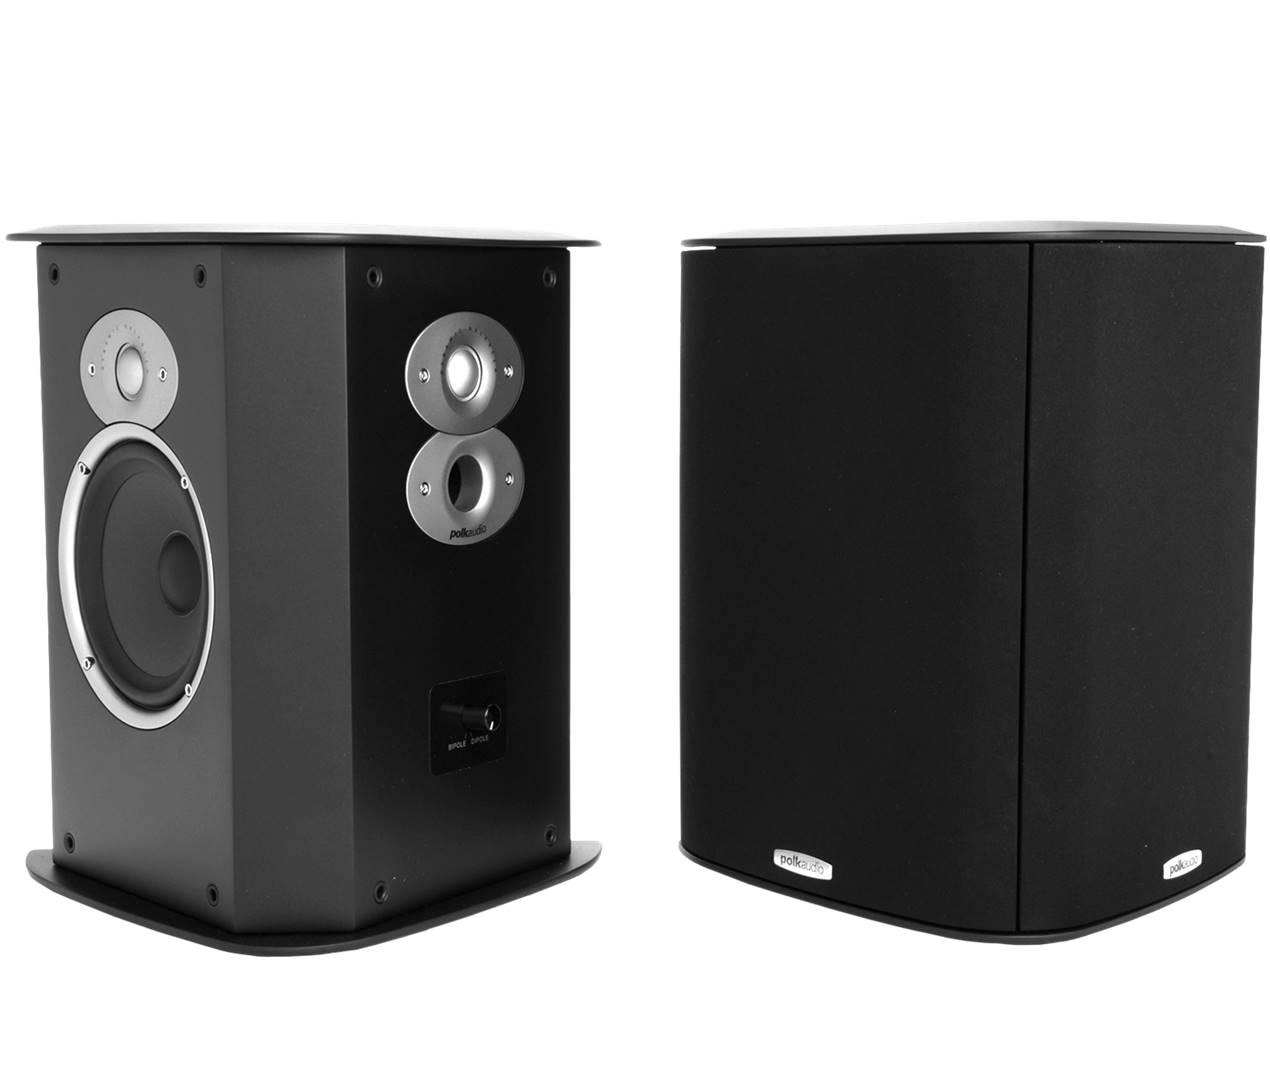 Polk Audio FXI A6 Surround Sound Speakers